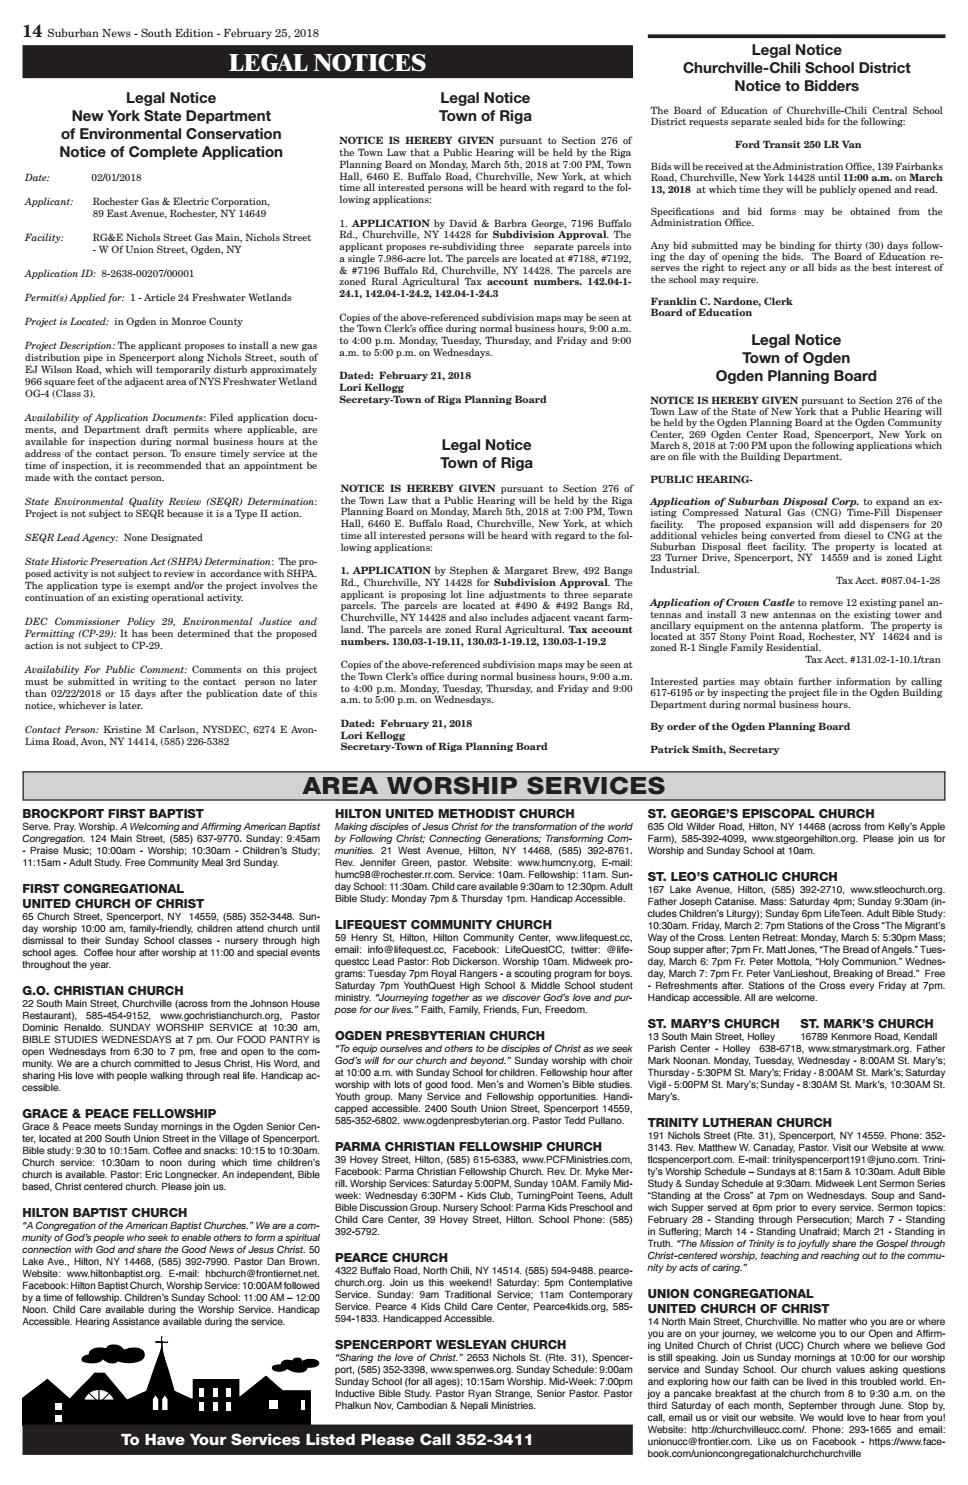 Suburban News South Edition February 25 2018 By Westside News Inc